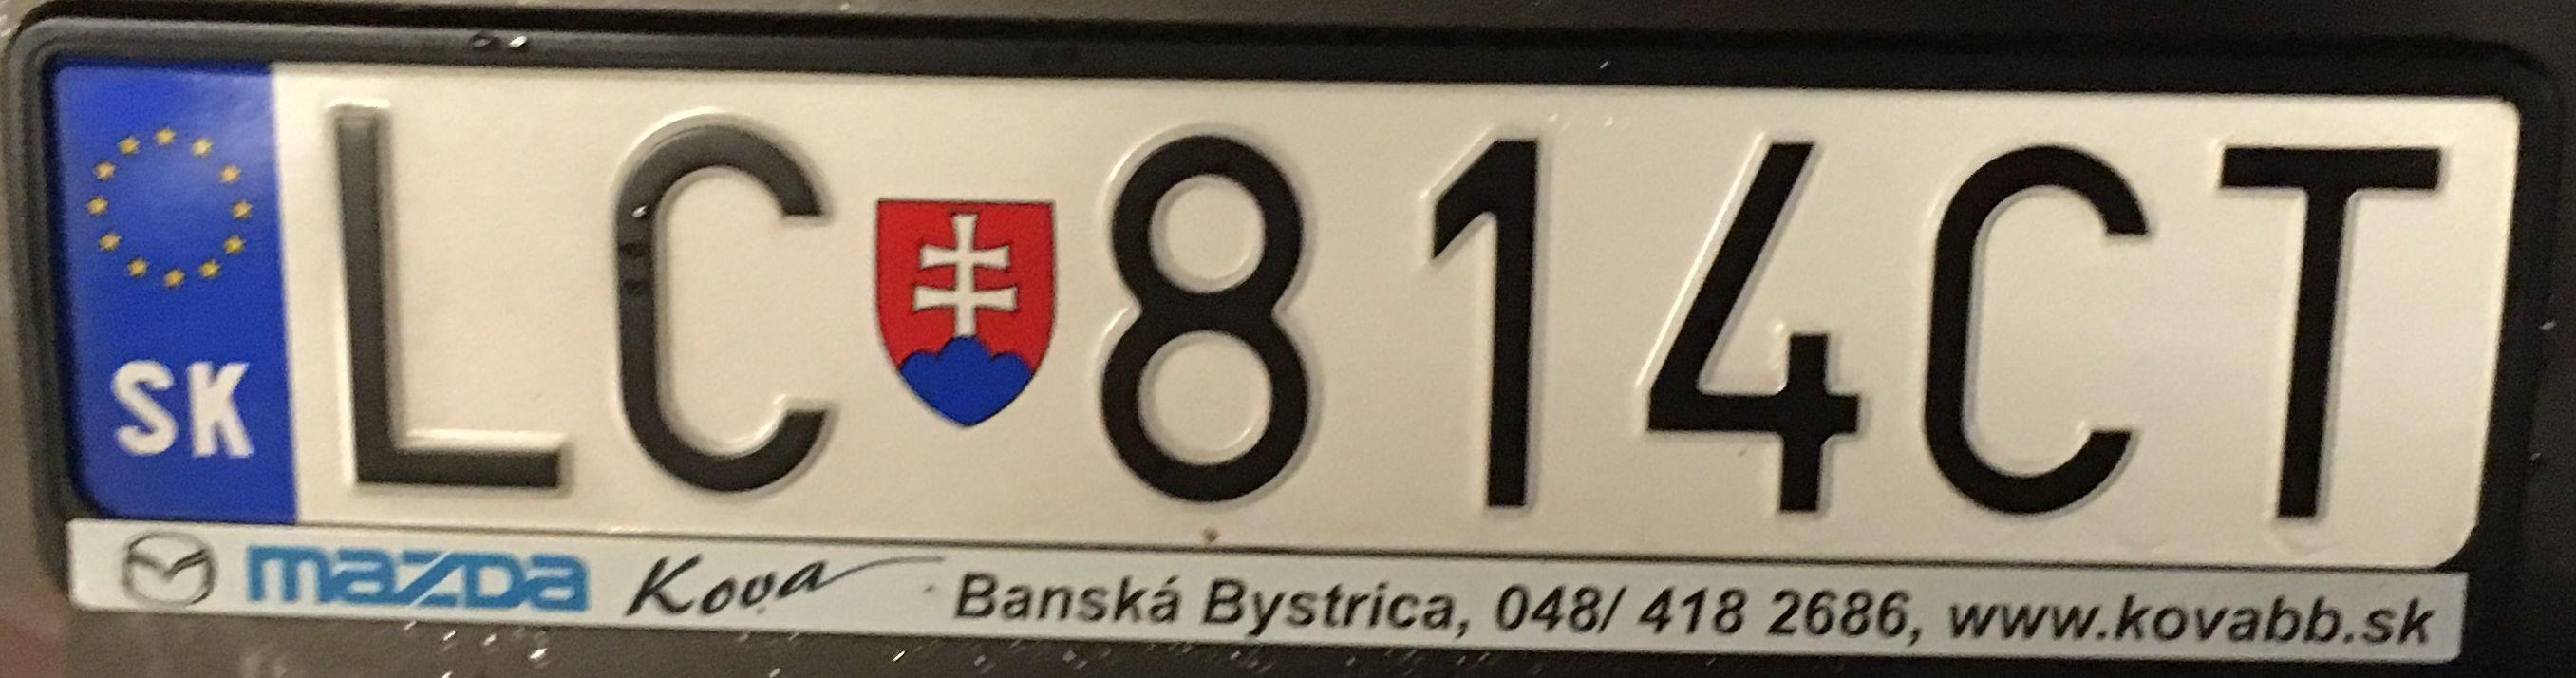 Registrační značka Slovensko - LC - Lučenec, foto:www.podalnici.cz